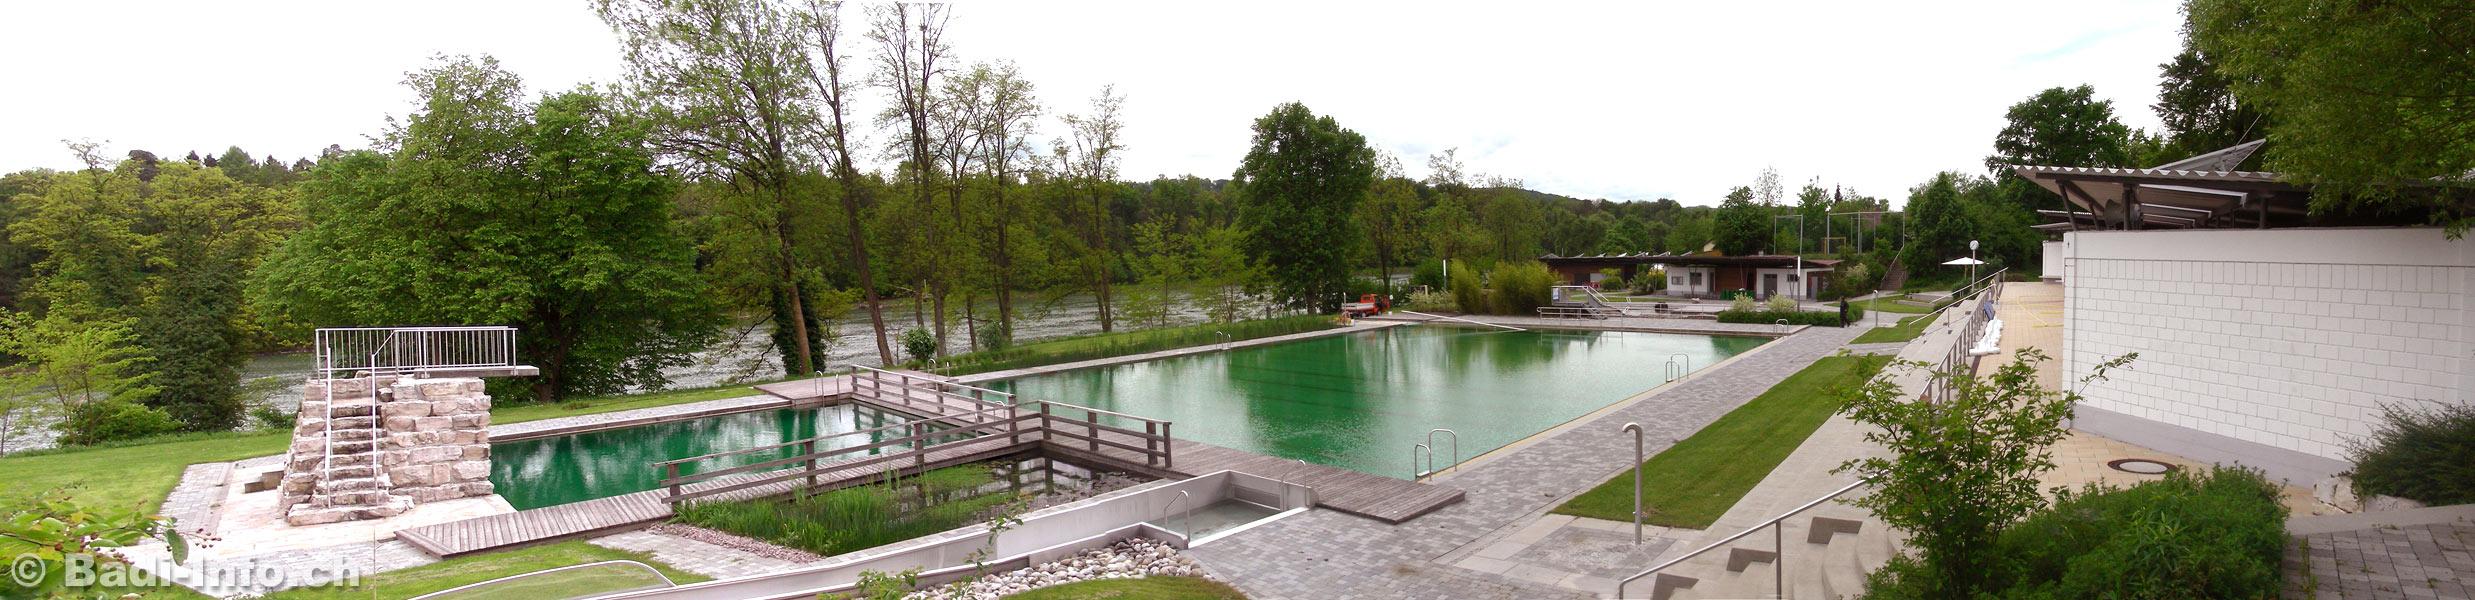 bettingen schweiz schwimmbad in germany